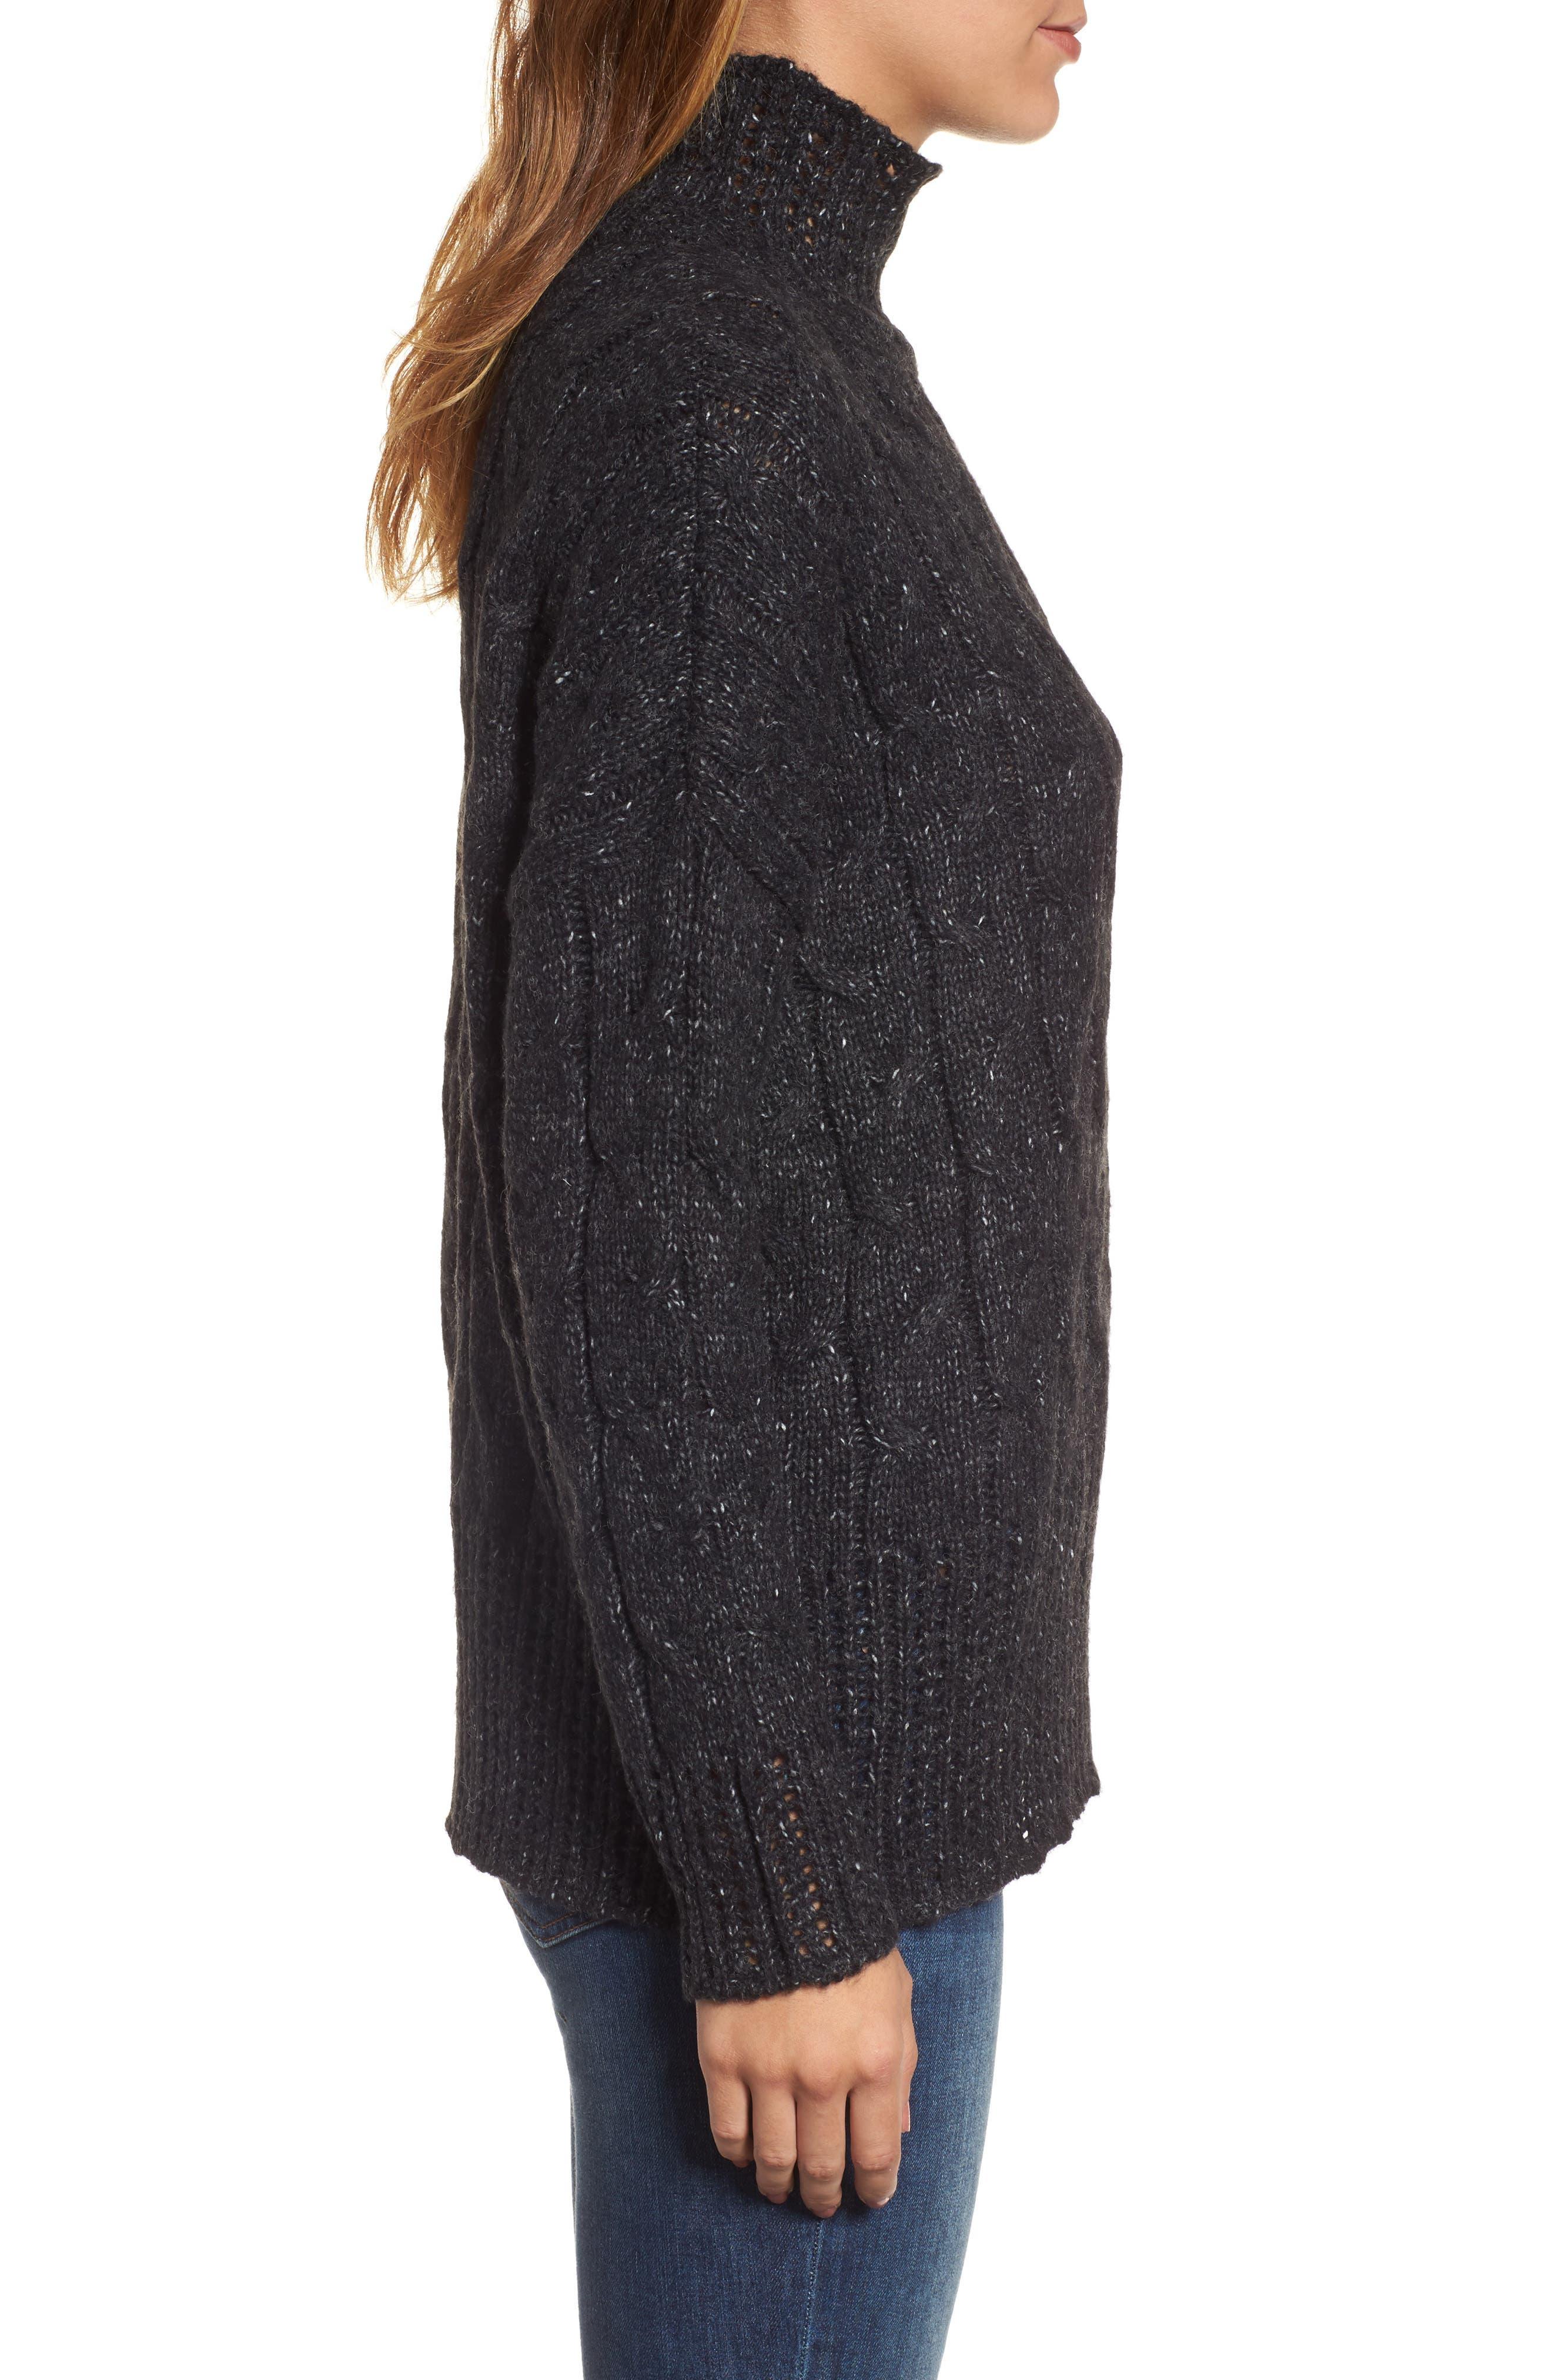 Pointelle Turtleneck Sweater,                             Alternate thumbnail 3, color,                             001